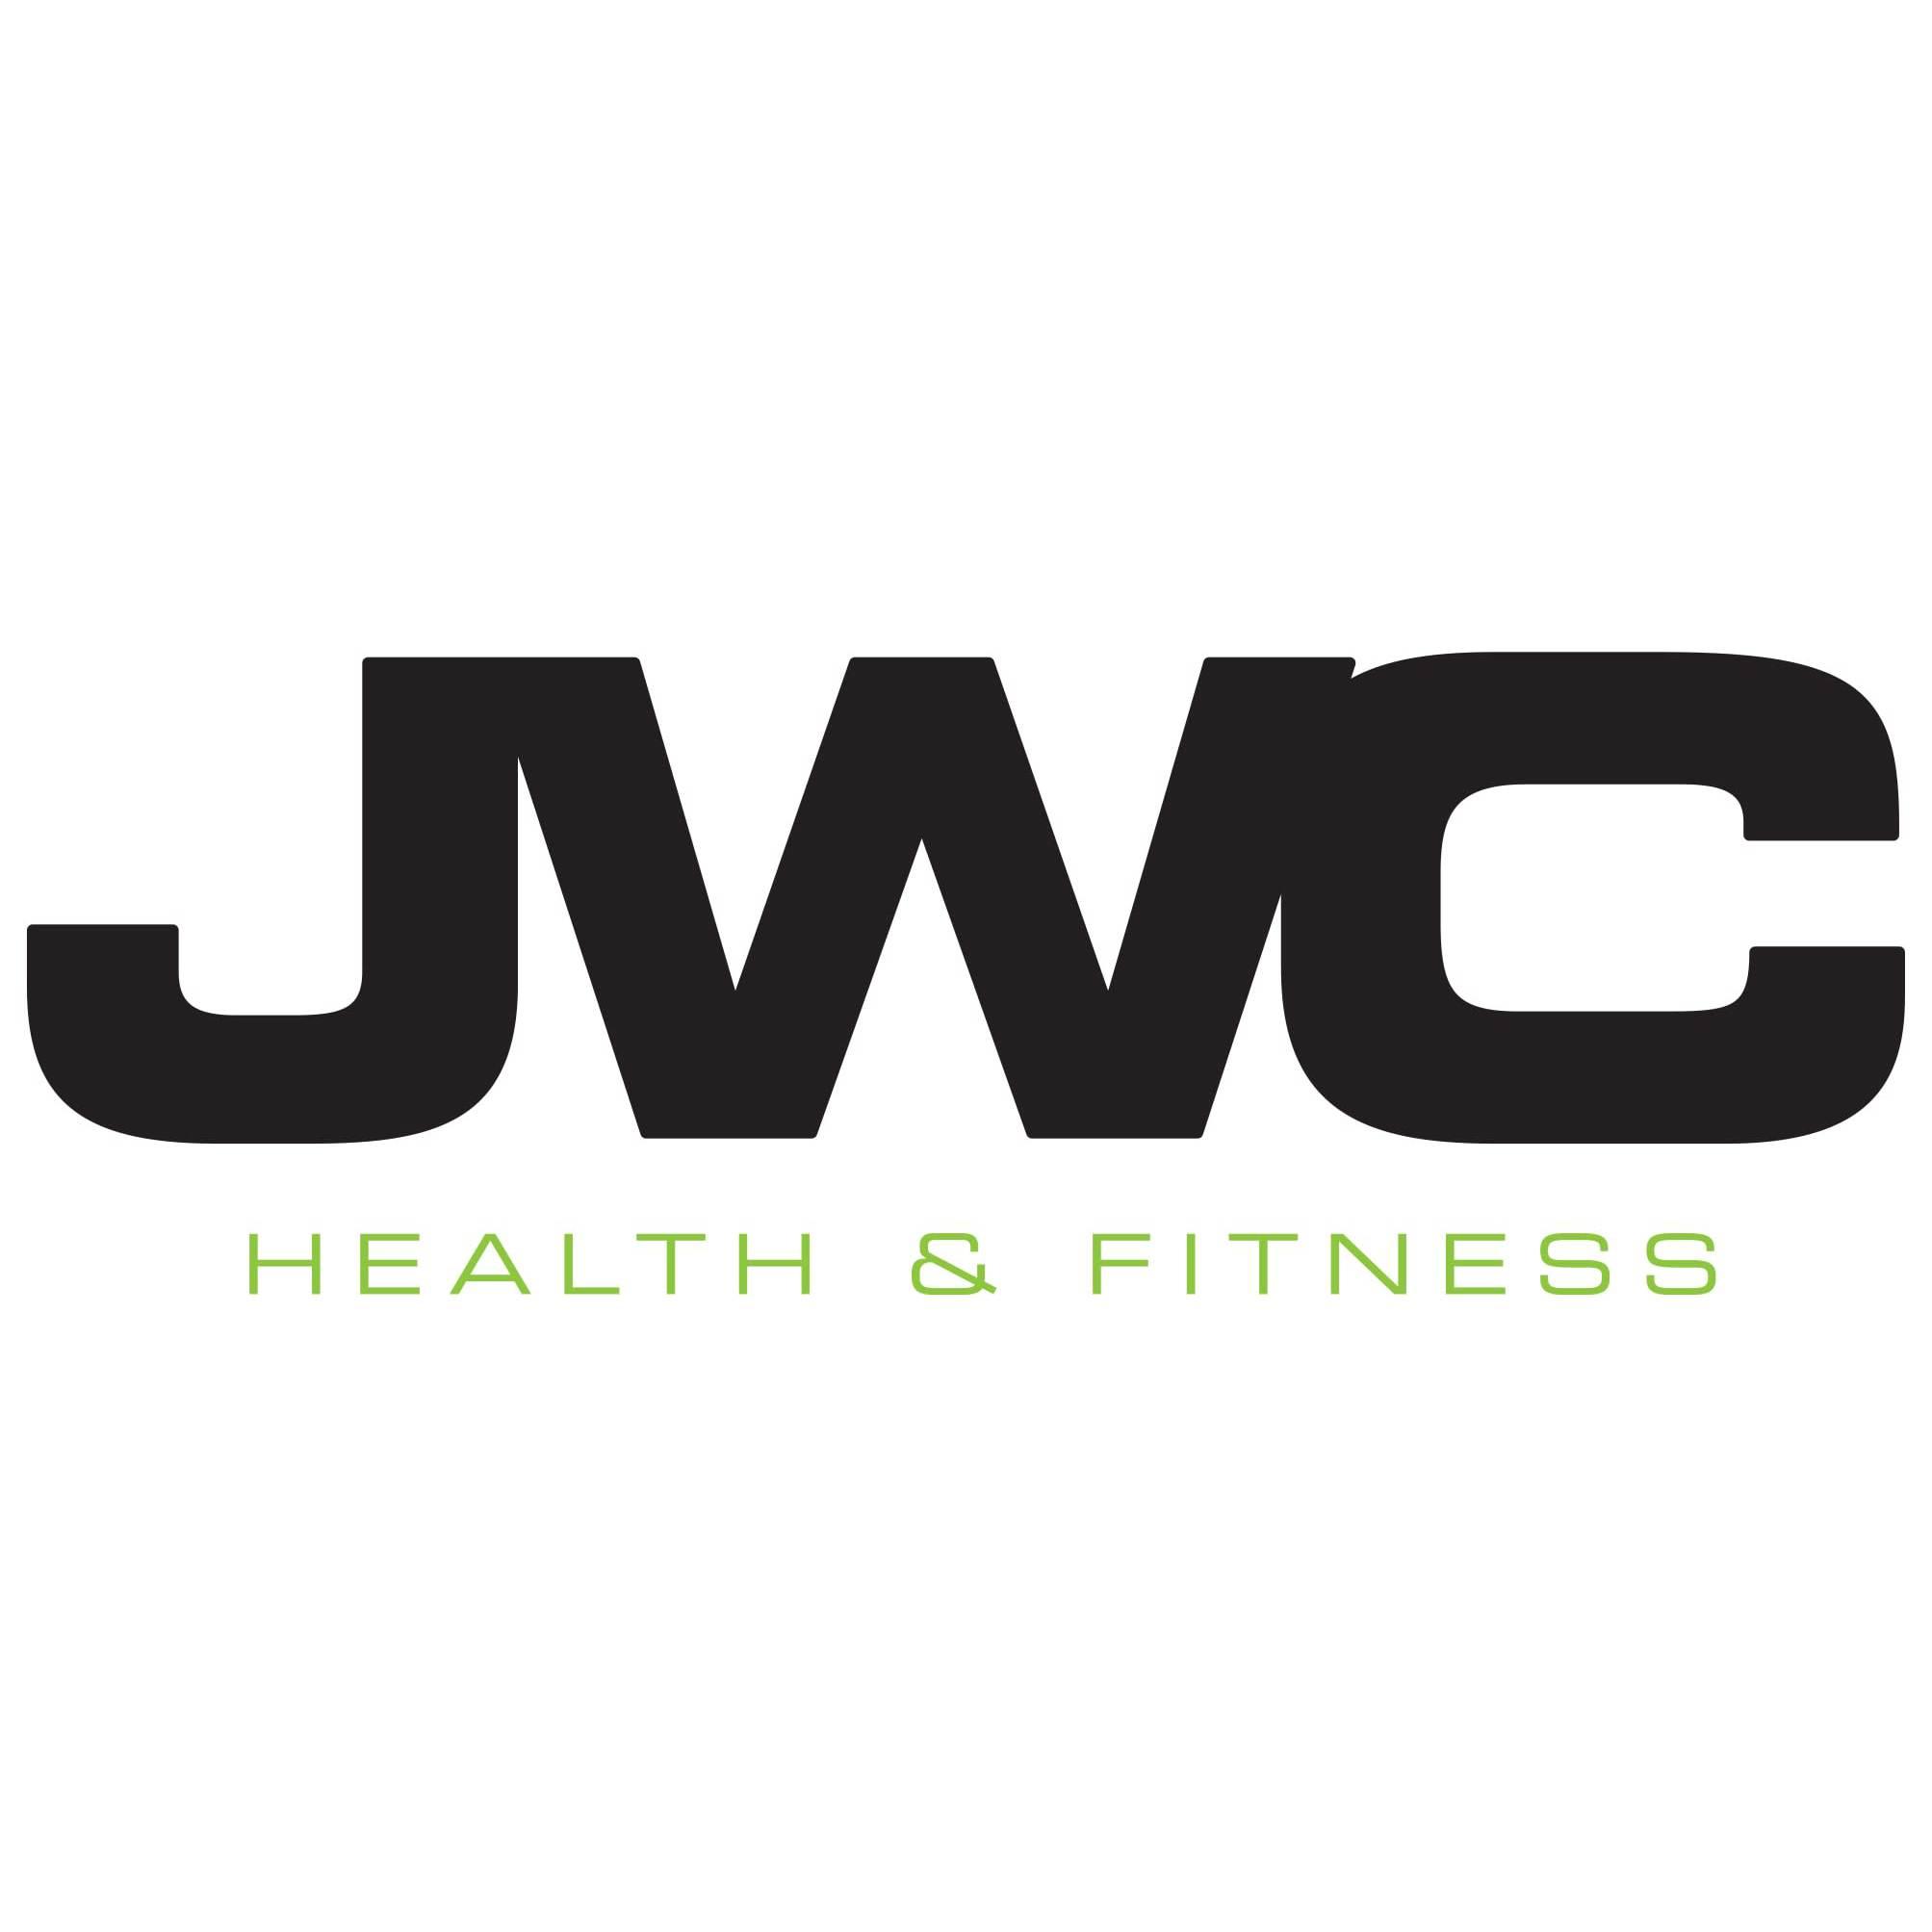 JWC Health & Fitness - Holmes Chapel